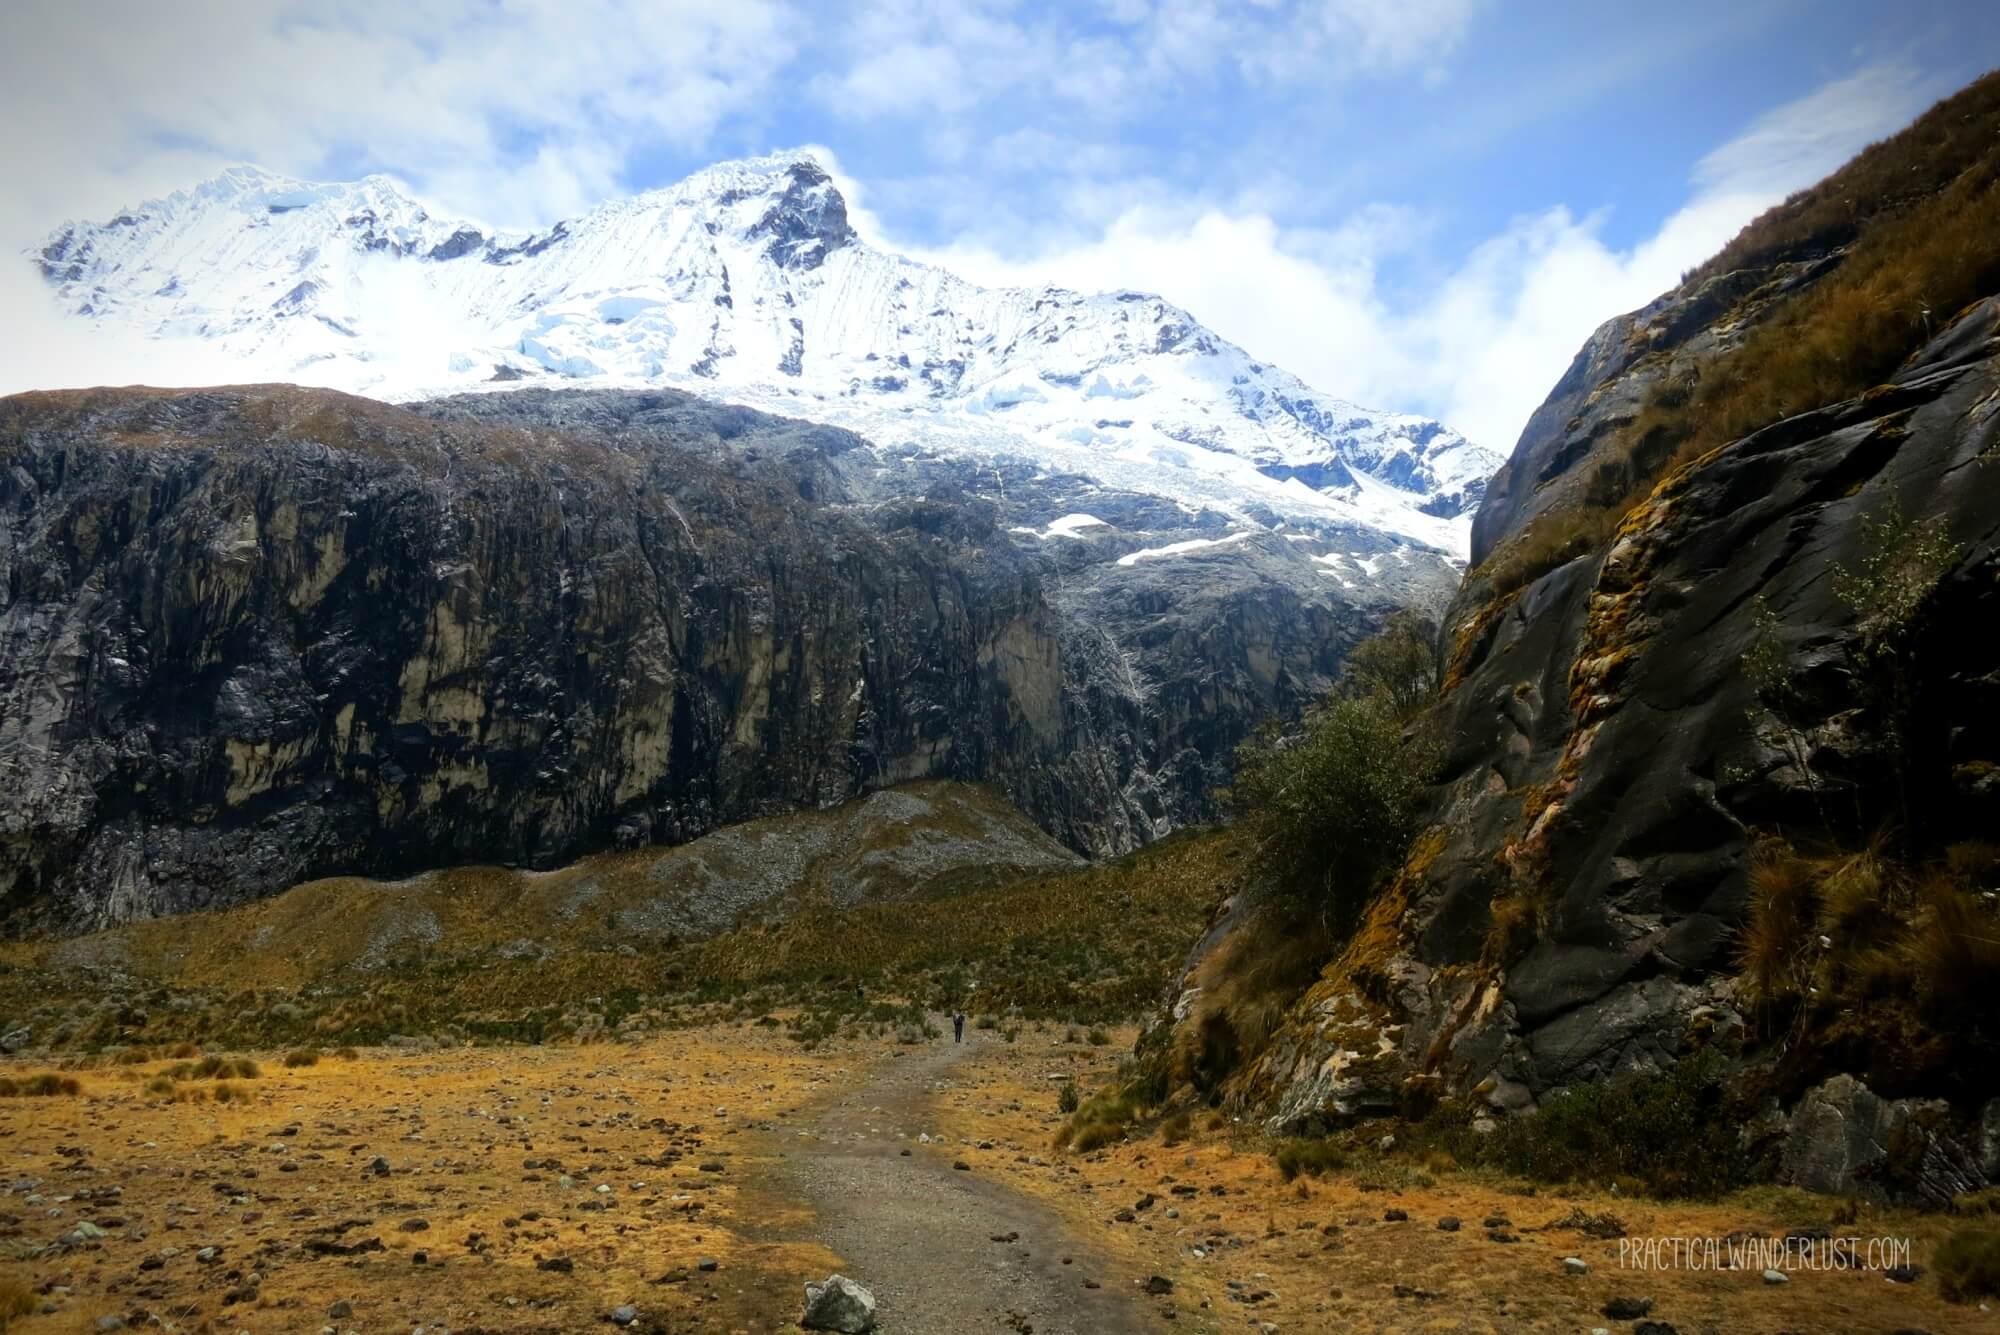 Marshy grassland at the base of a glacier on the Laguna 69 hike in Huaraz, Peru in the Cordillera Blancas.